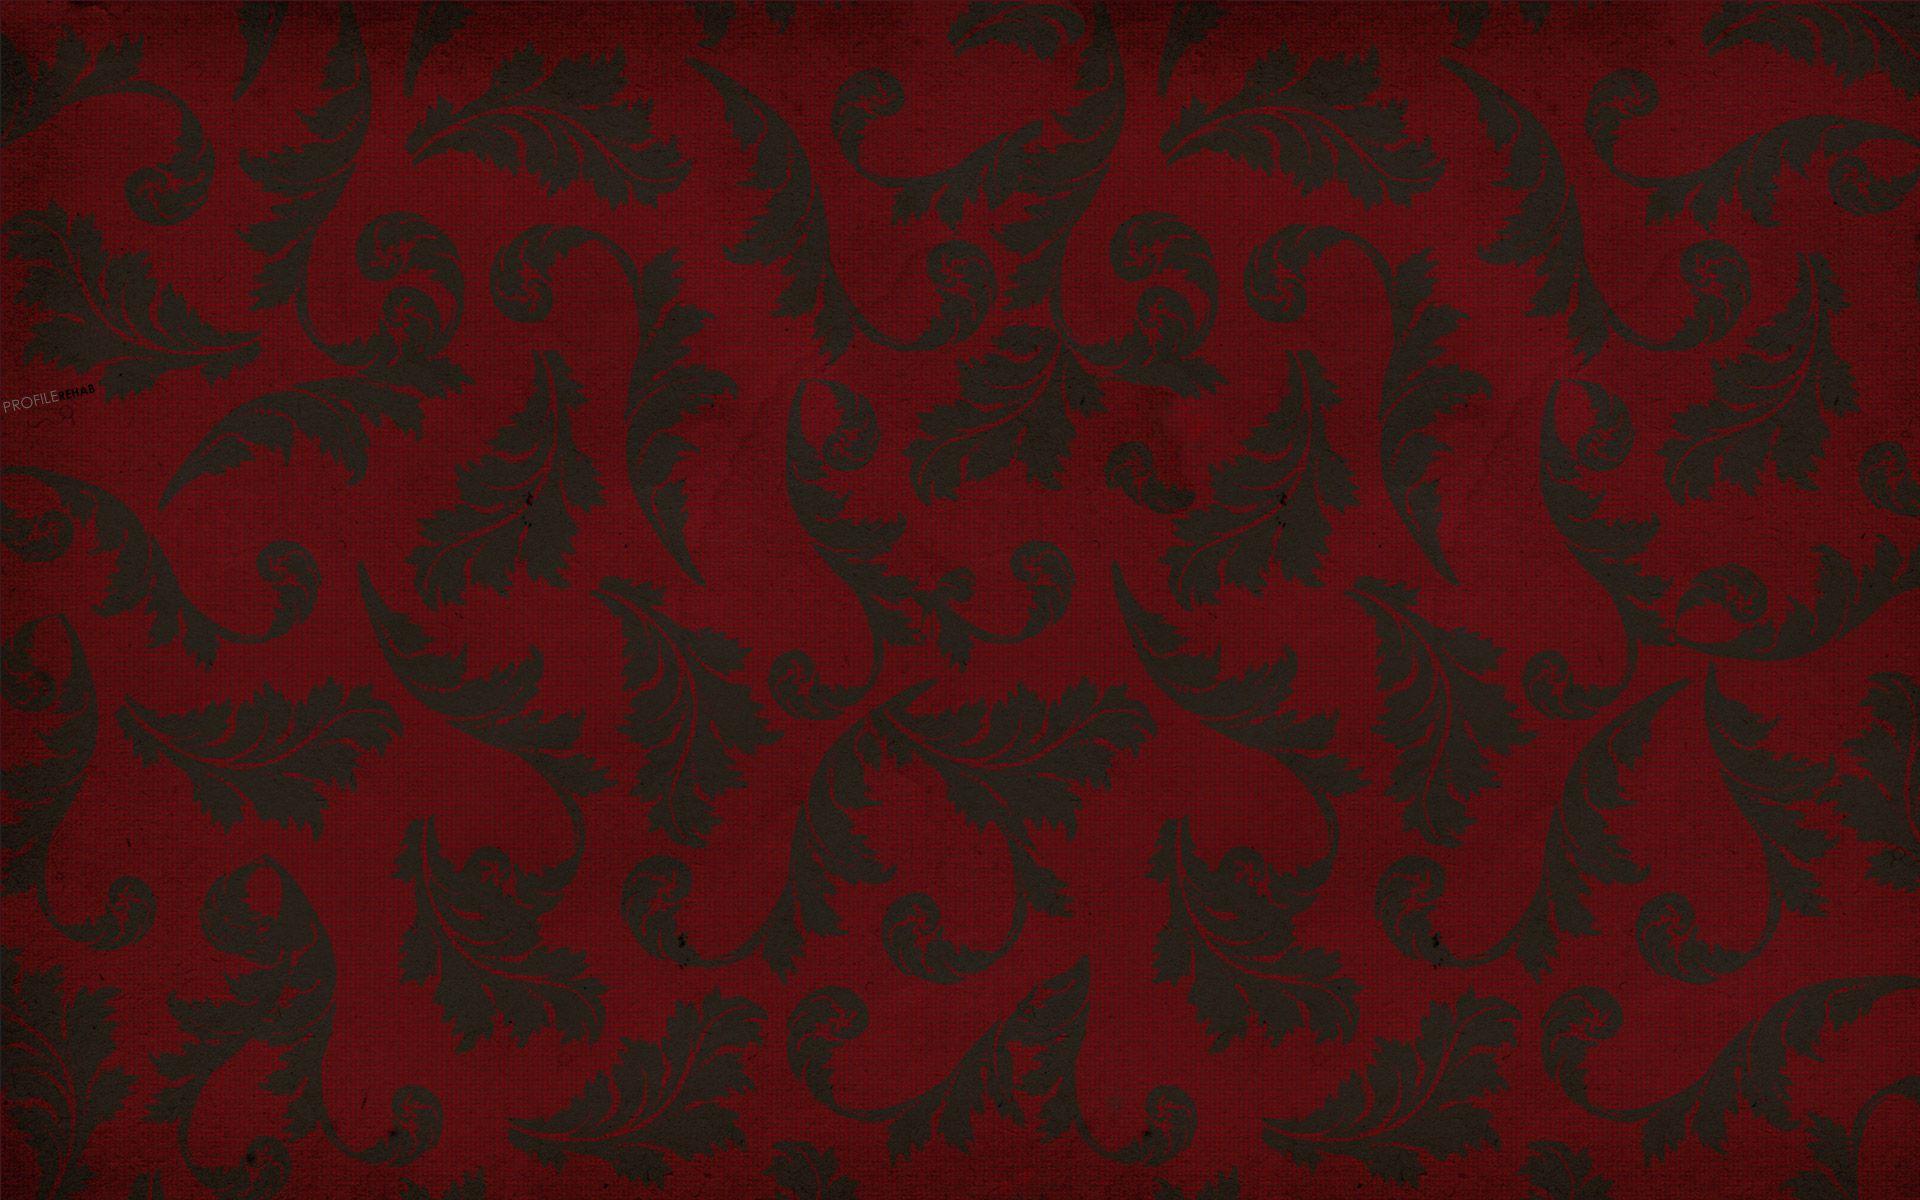 Black Design Background Red Theme Scenic Twitter Designs